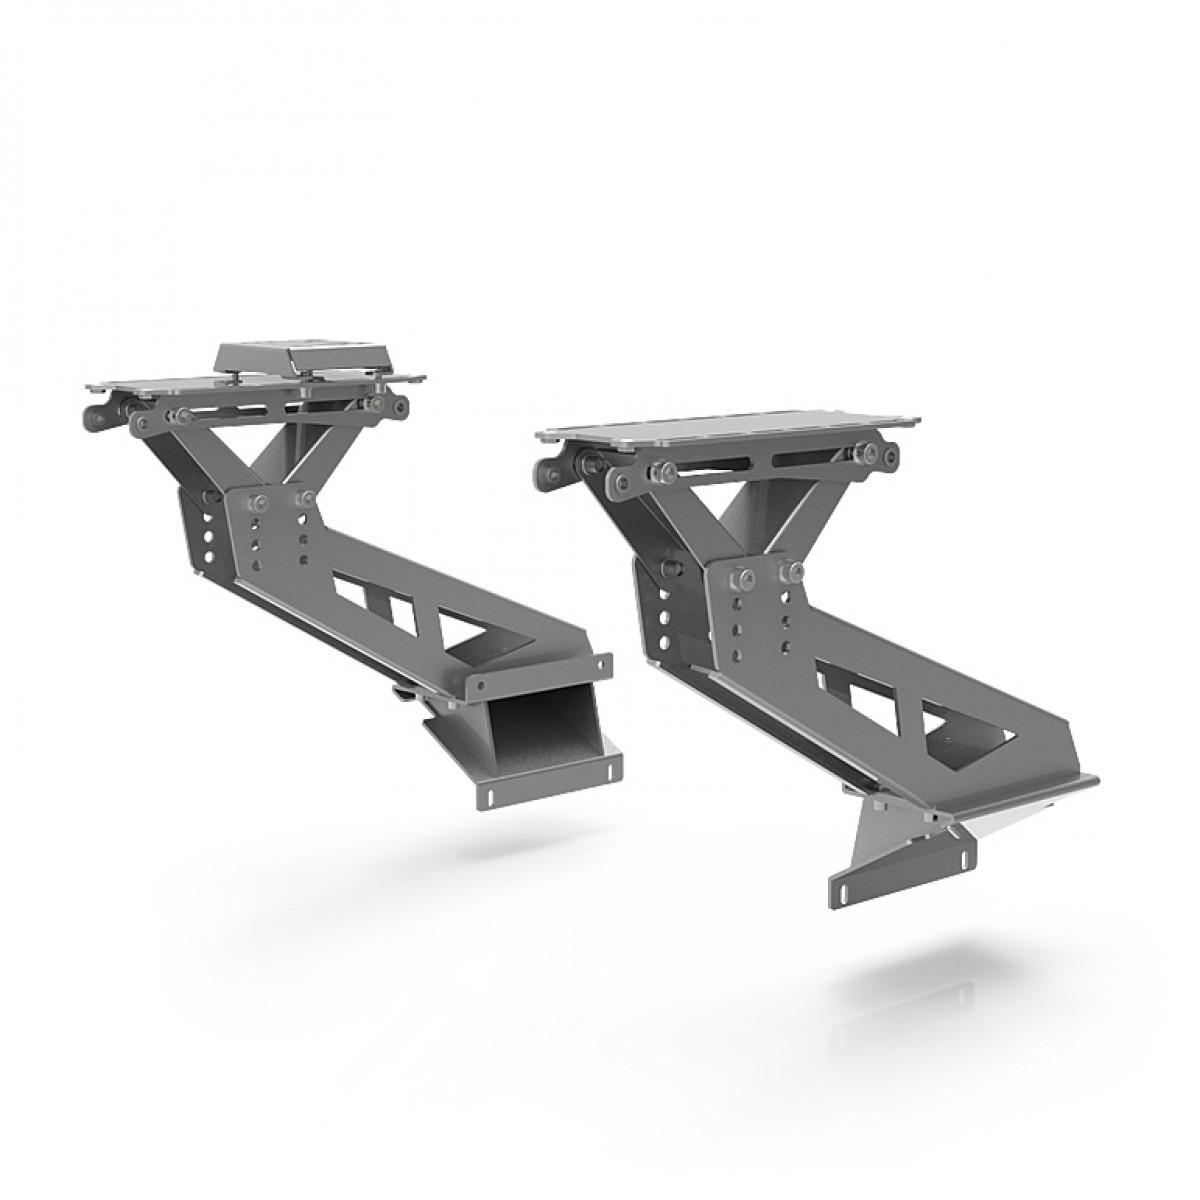 S1 Flight Mount Upgrade Kit Argent Support pour Thrustmaster HOTAS Warthog